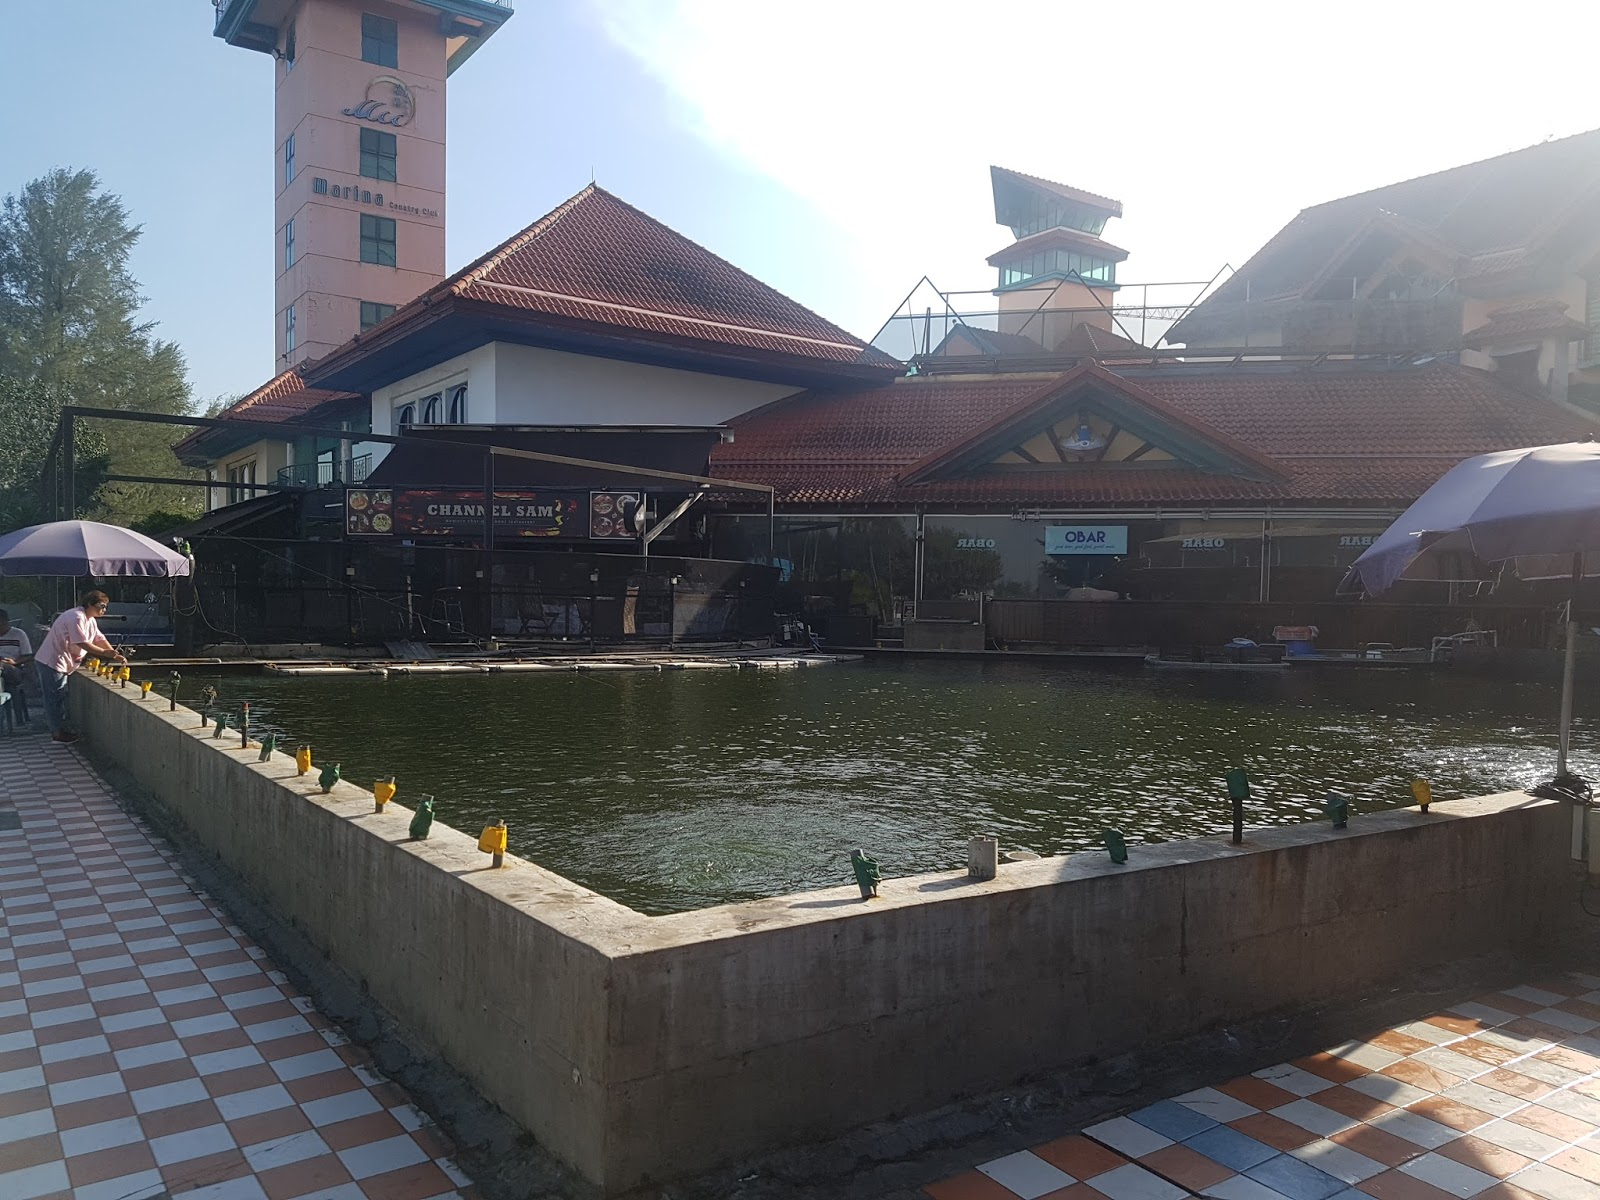 Baktao heaven gills fishing pond singapore at punggol - Least crowded swimming pool singapore ...